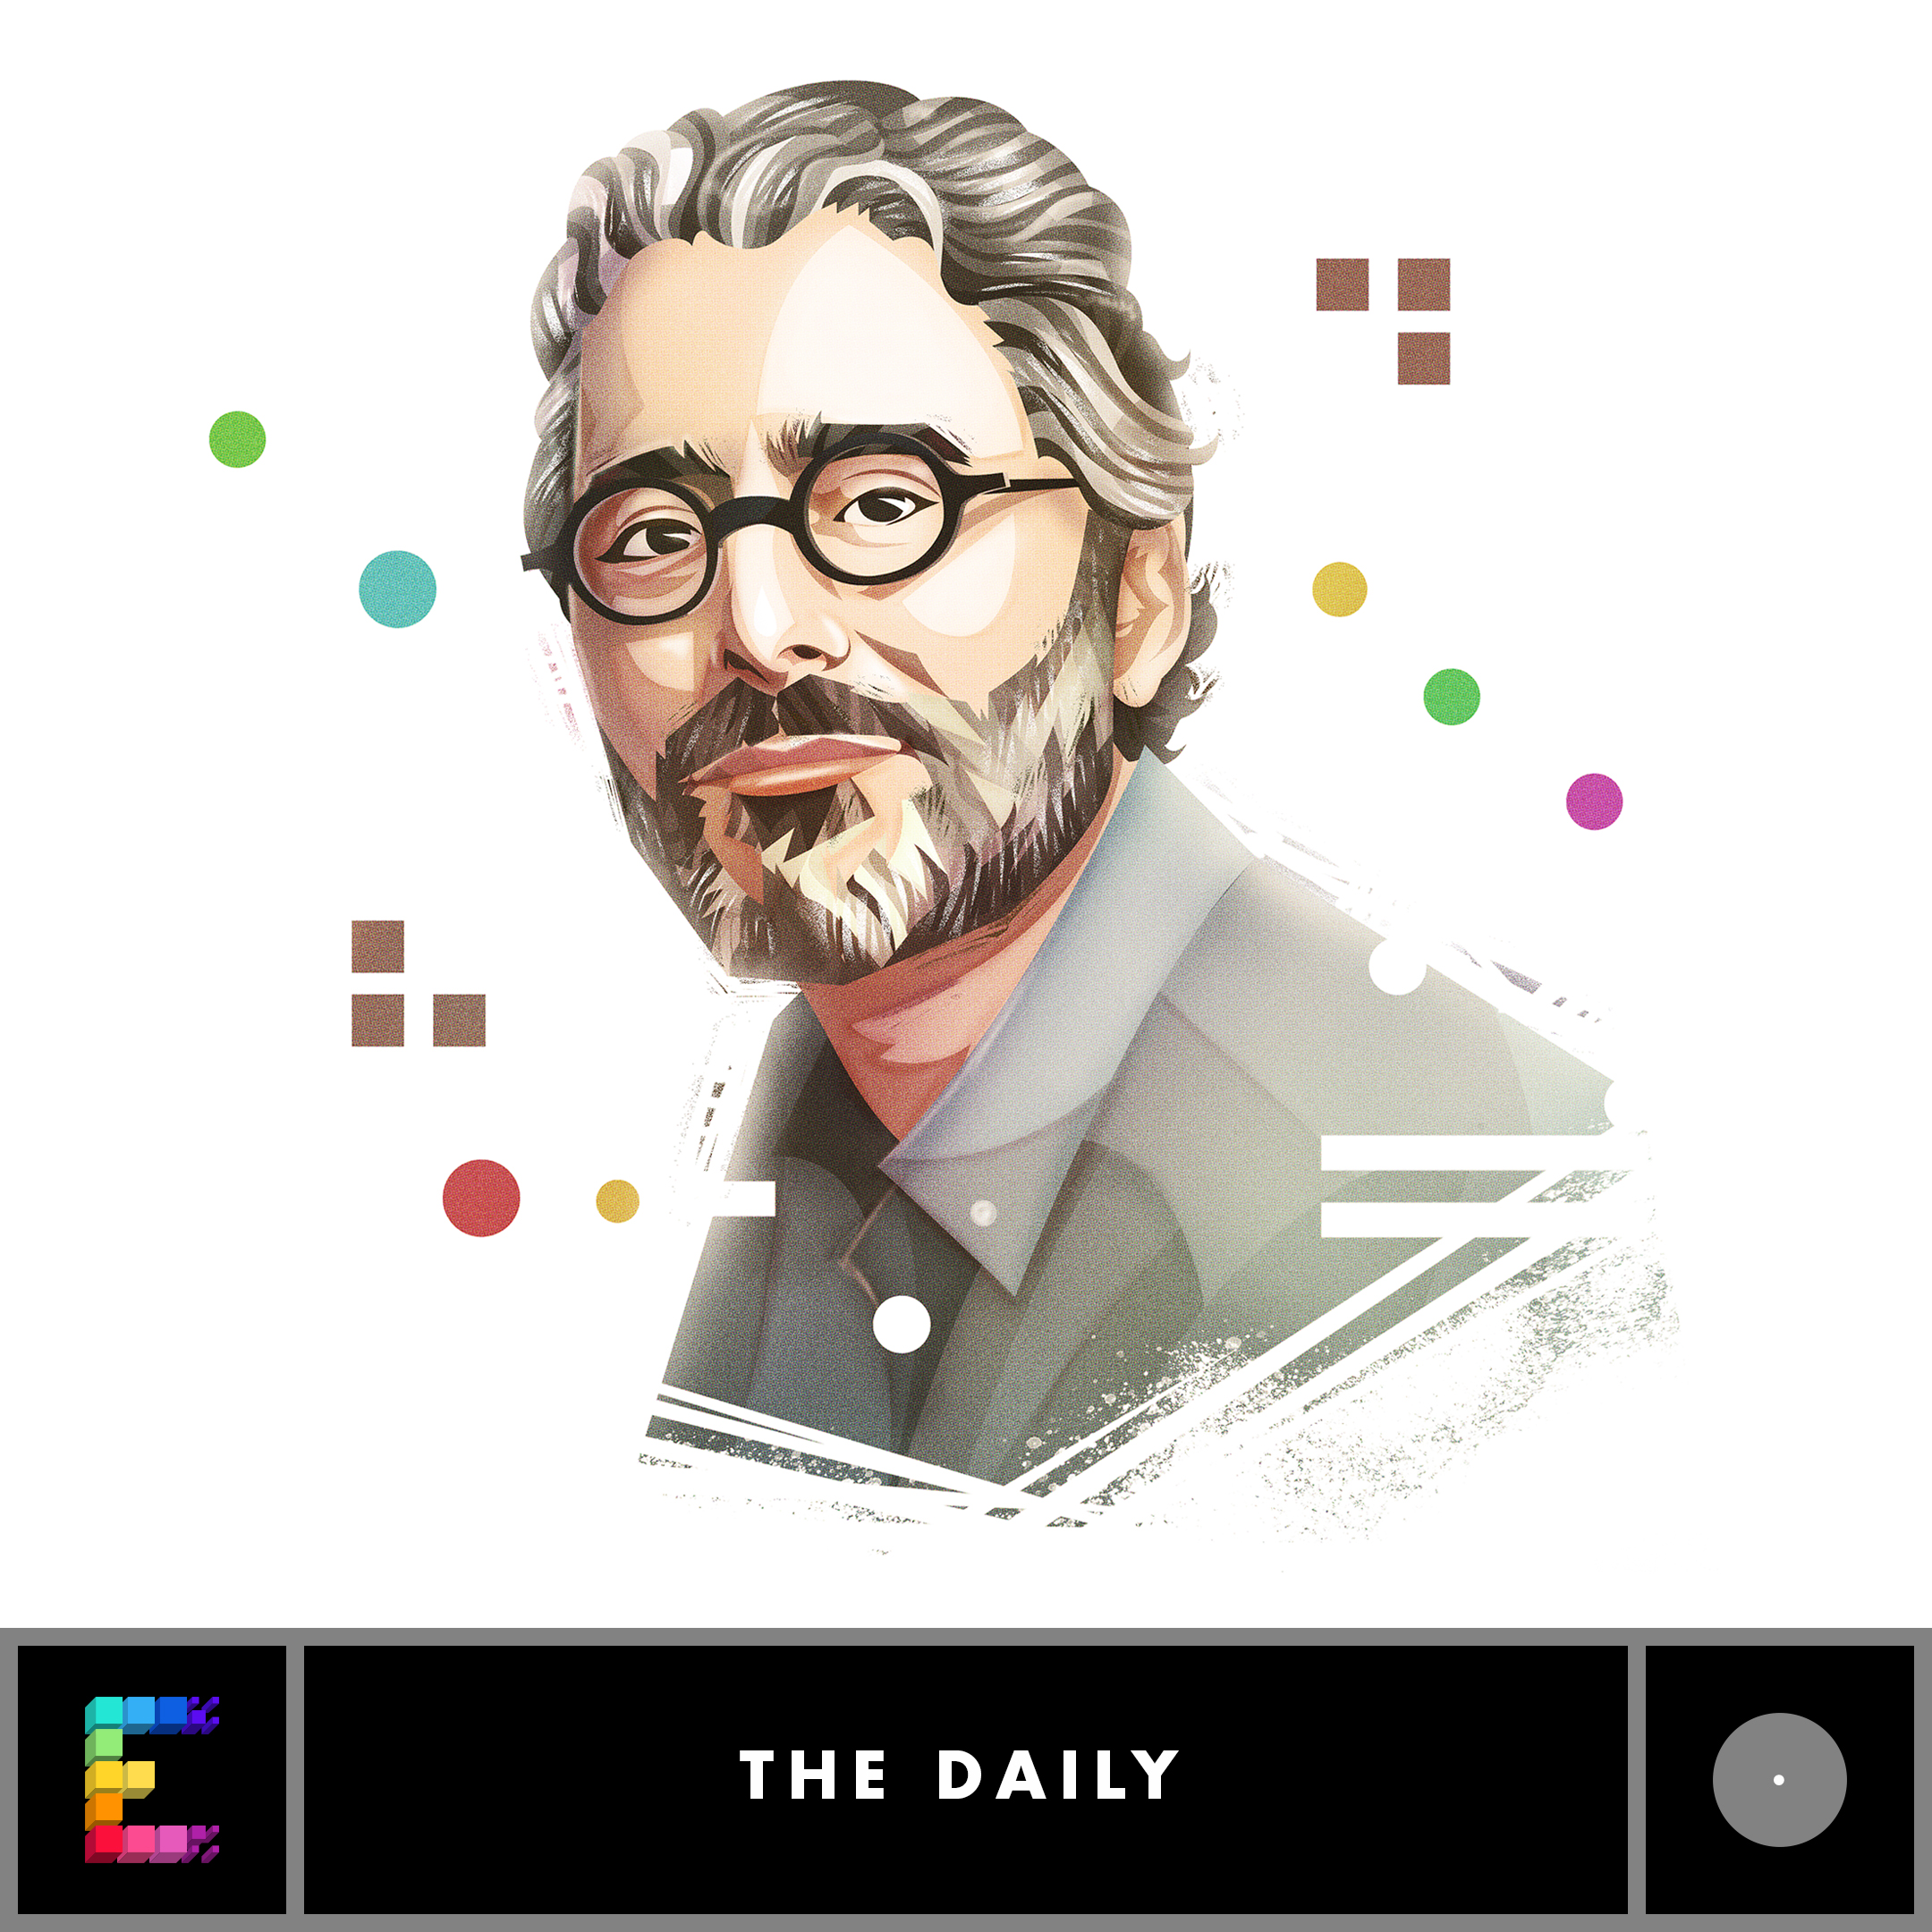 Wonderly - The Daily (Theme)